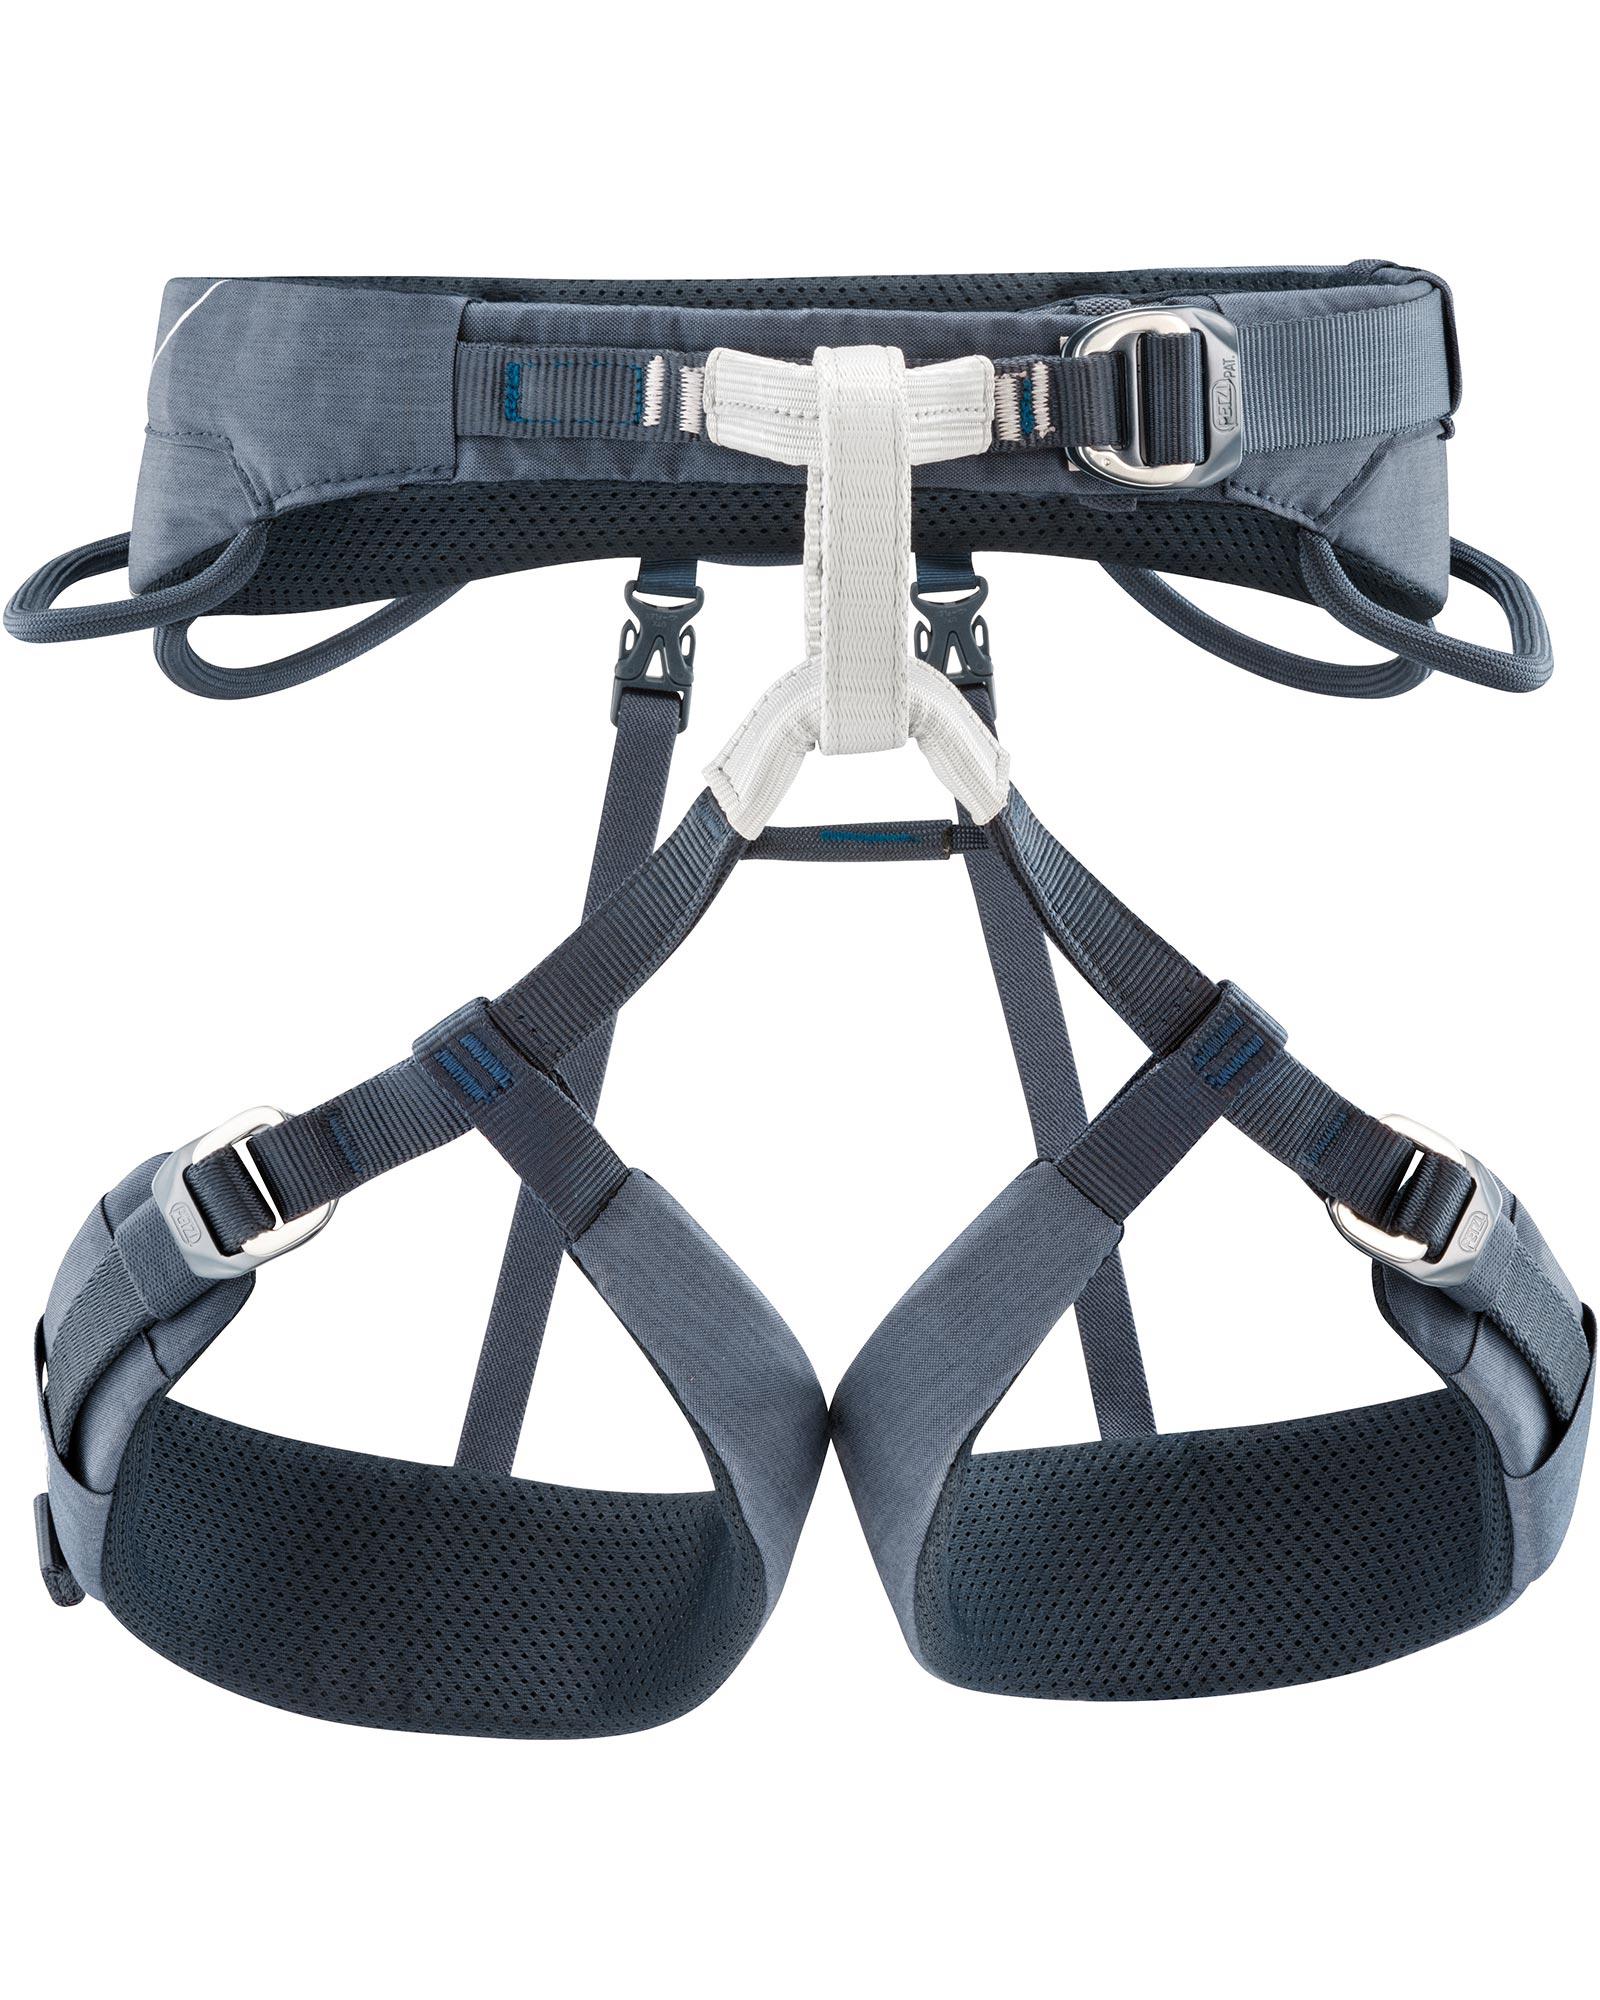 Petzl Men's Adjama Climbing Harness 0